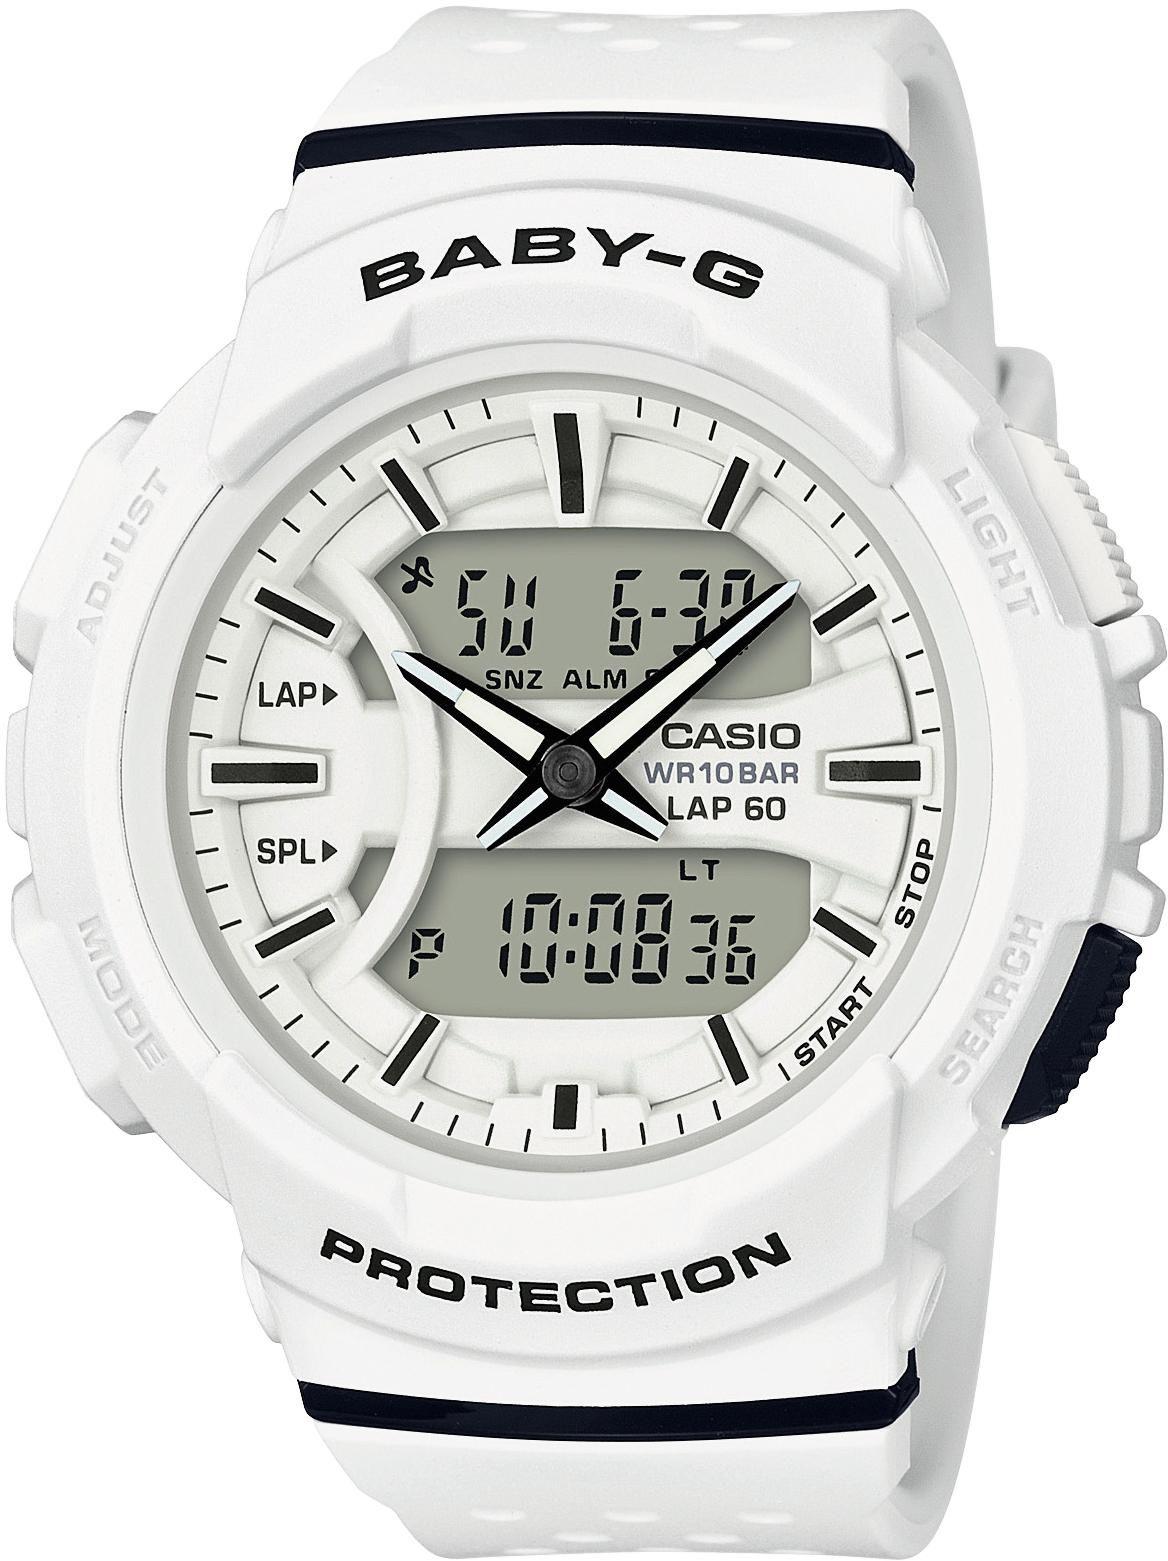 CASIO BABY G Casio Baby-G Chronograph »ABG-240-7AER«